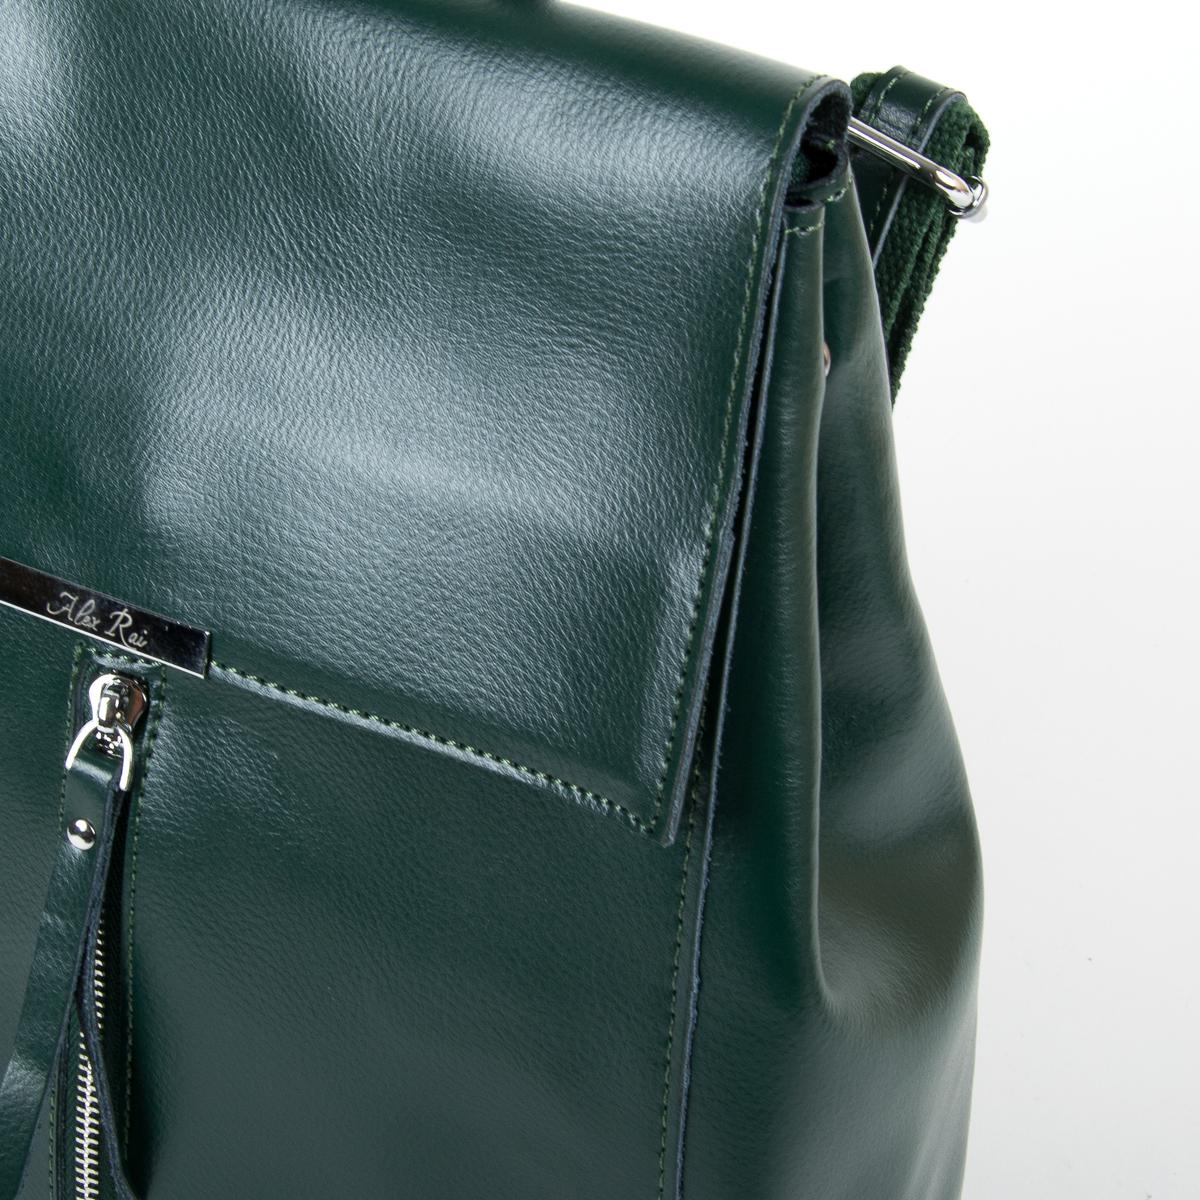 Сумка Женская Рюкзак кожа ALEX RAI 9-01 373 green - фото 3